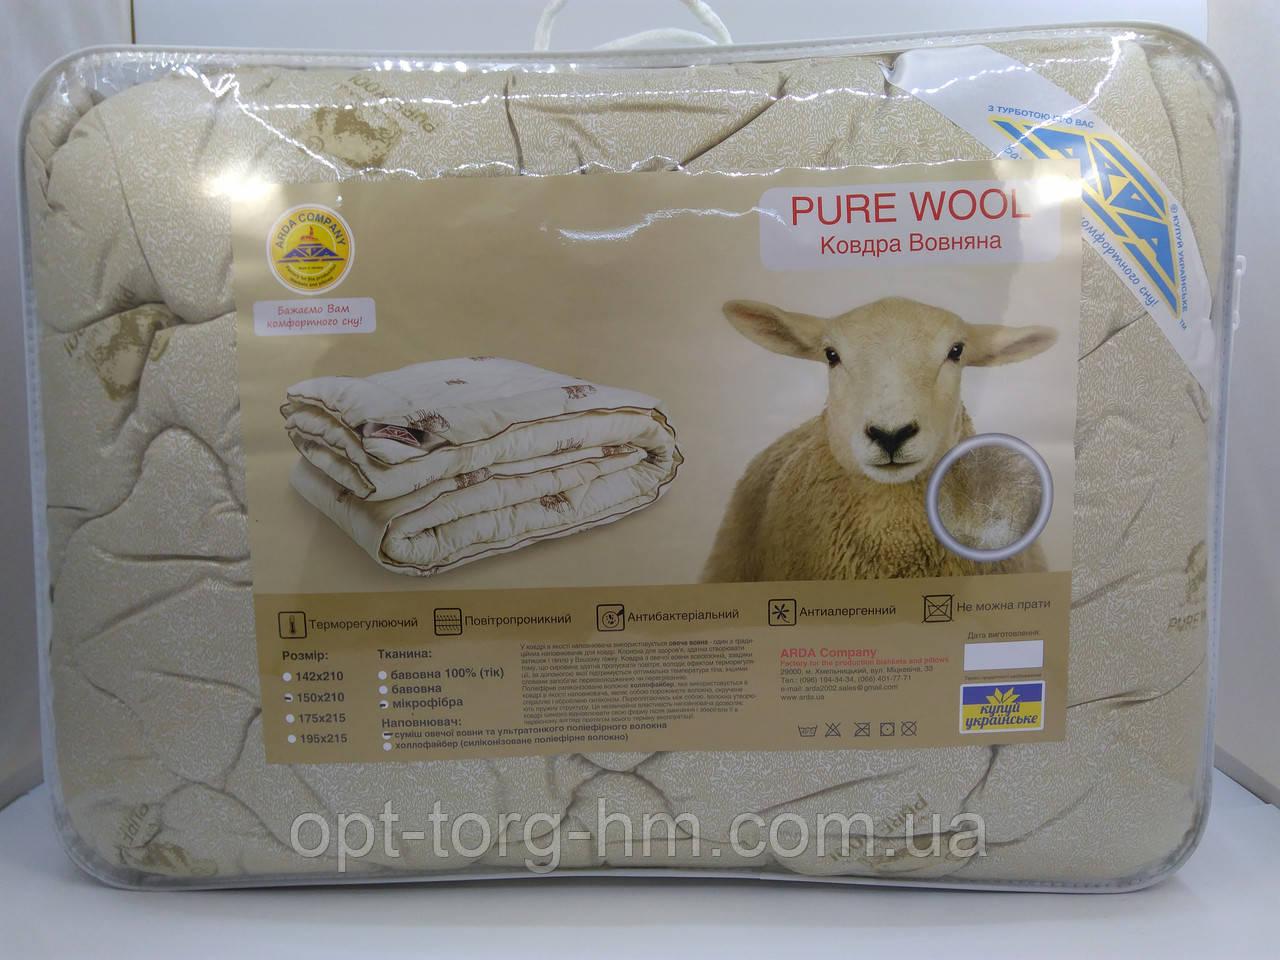 Одеяло Шерстяное Pure Wool 150*210 ARDA Company